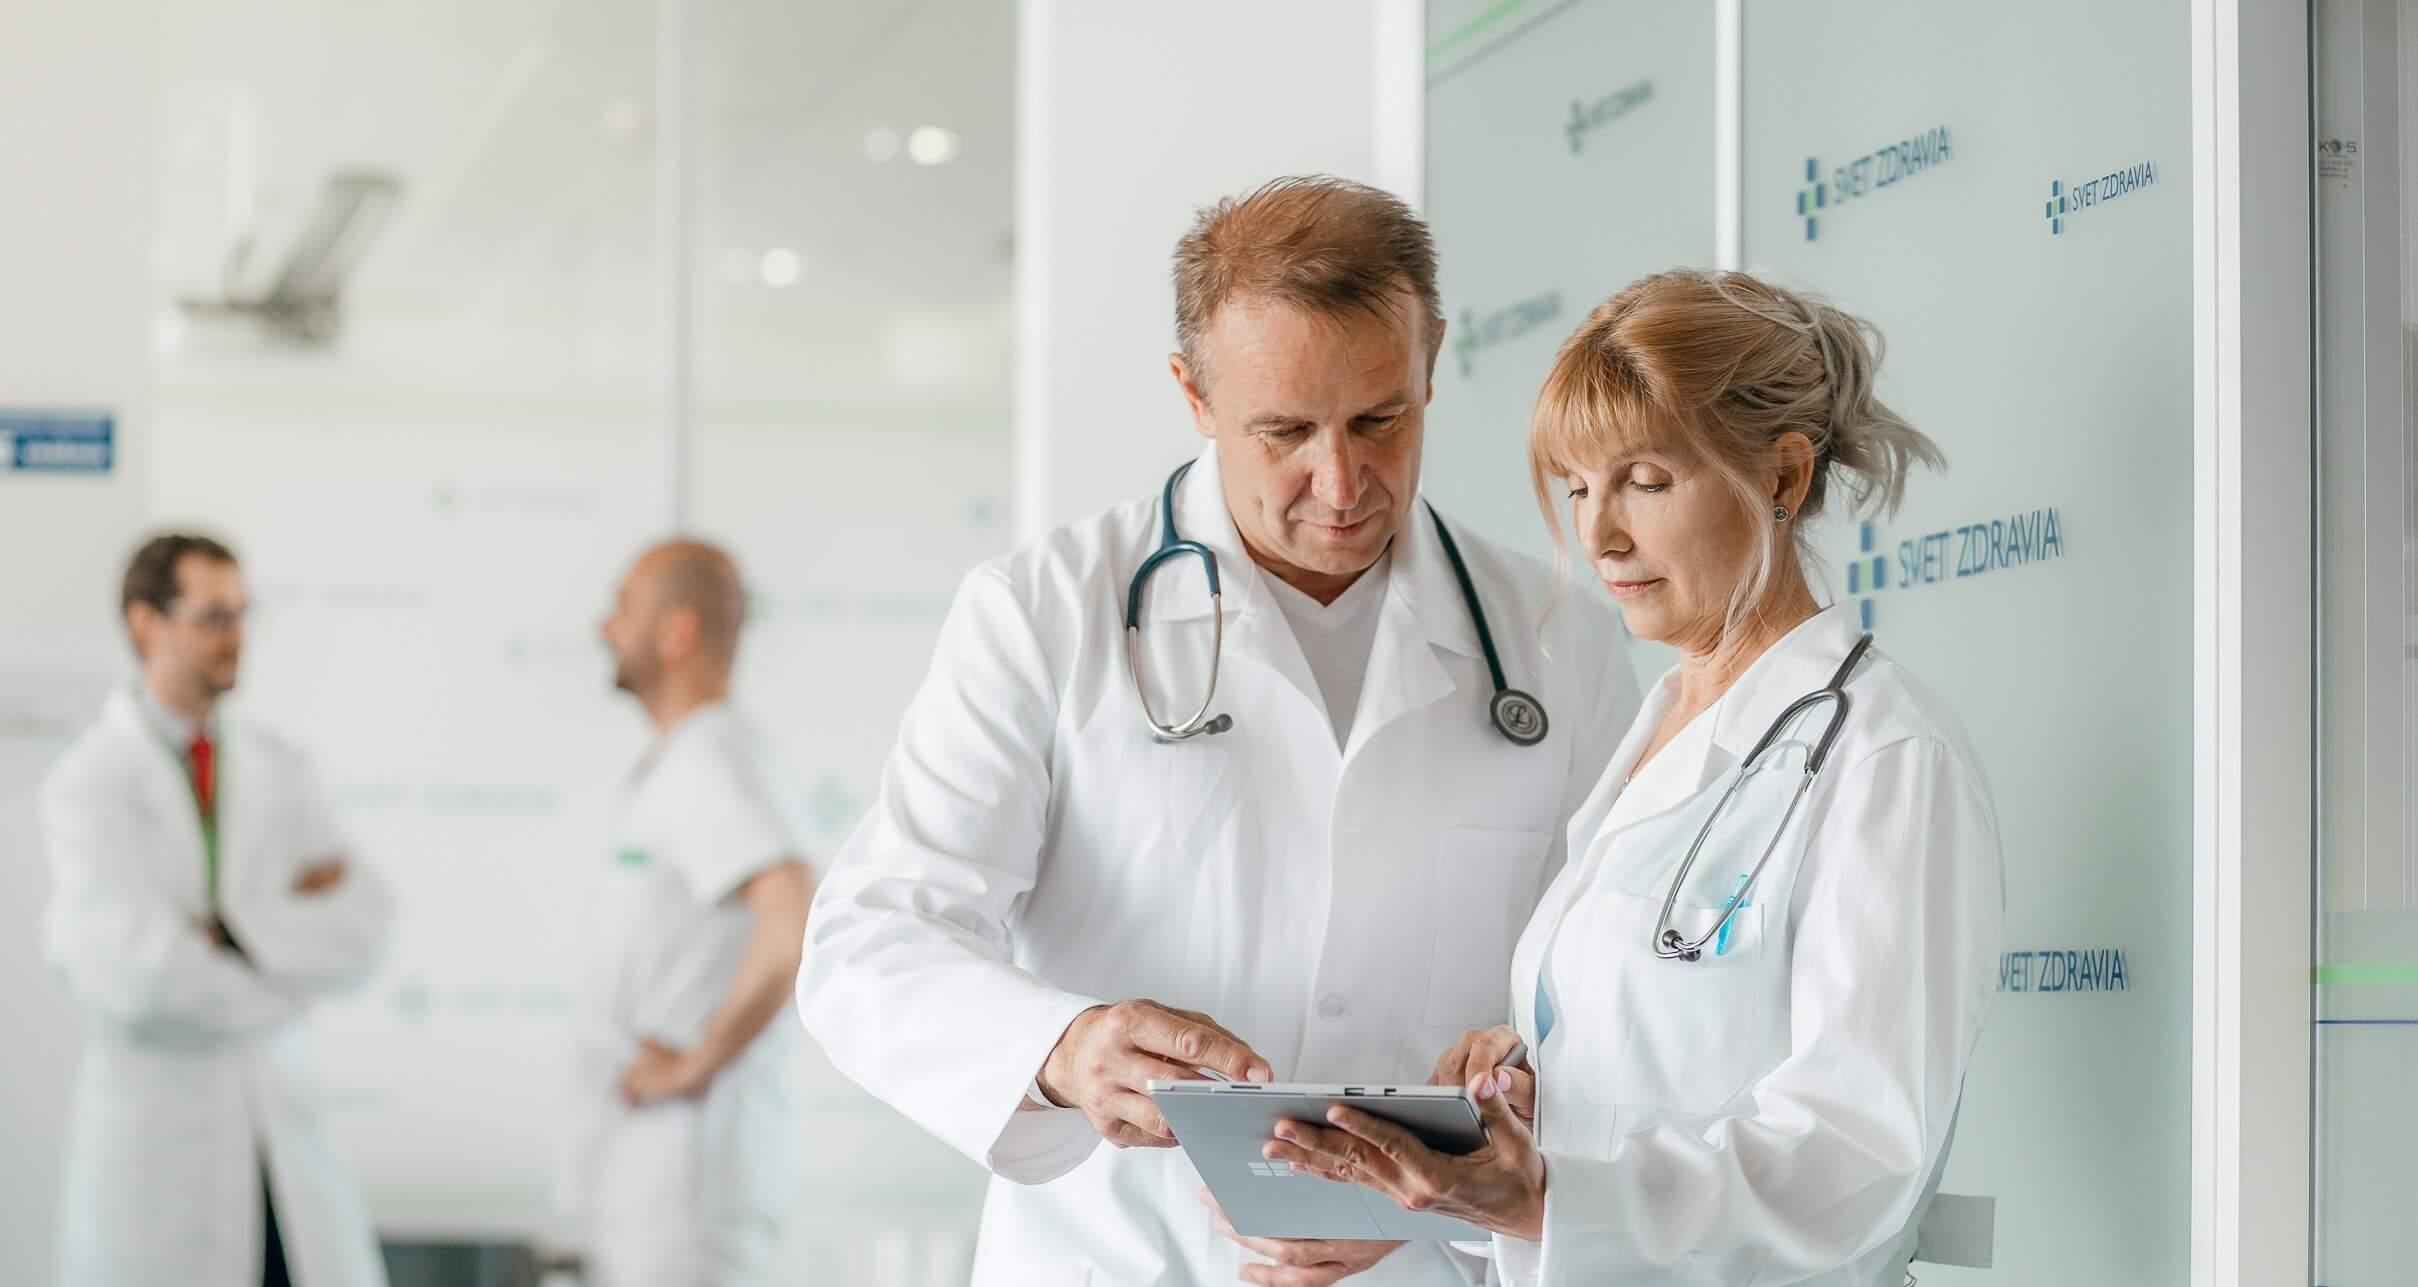 nemocnica bory moznosti karierneho rastu miroslav halecky helga kajanova konzultacia edukacia 2